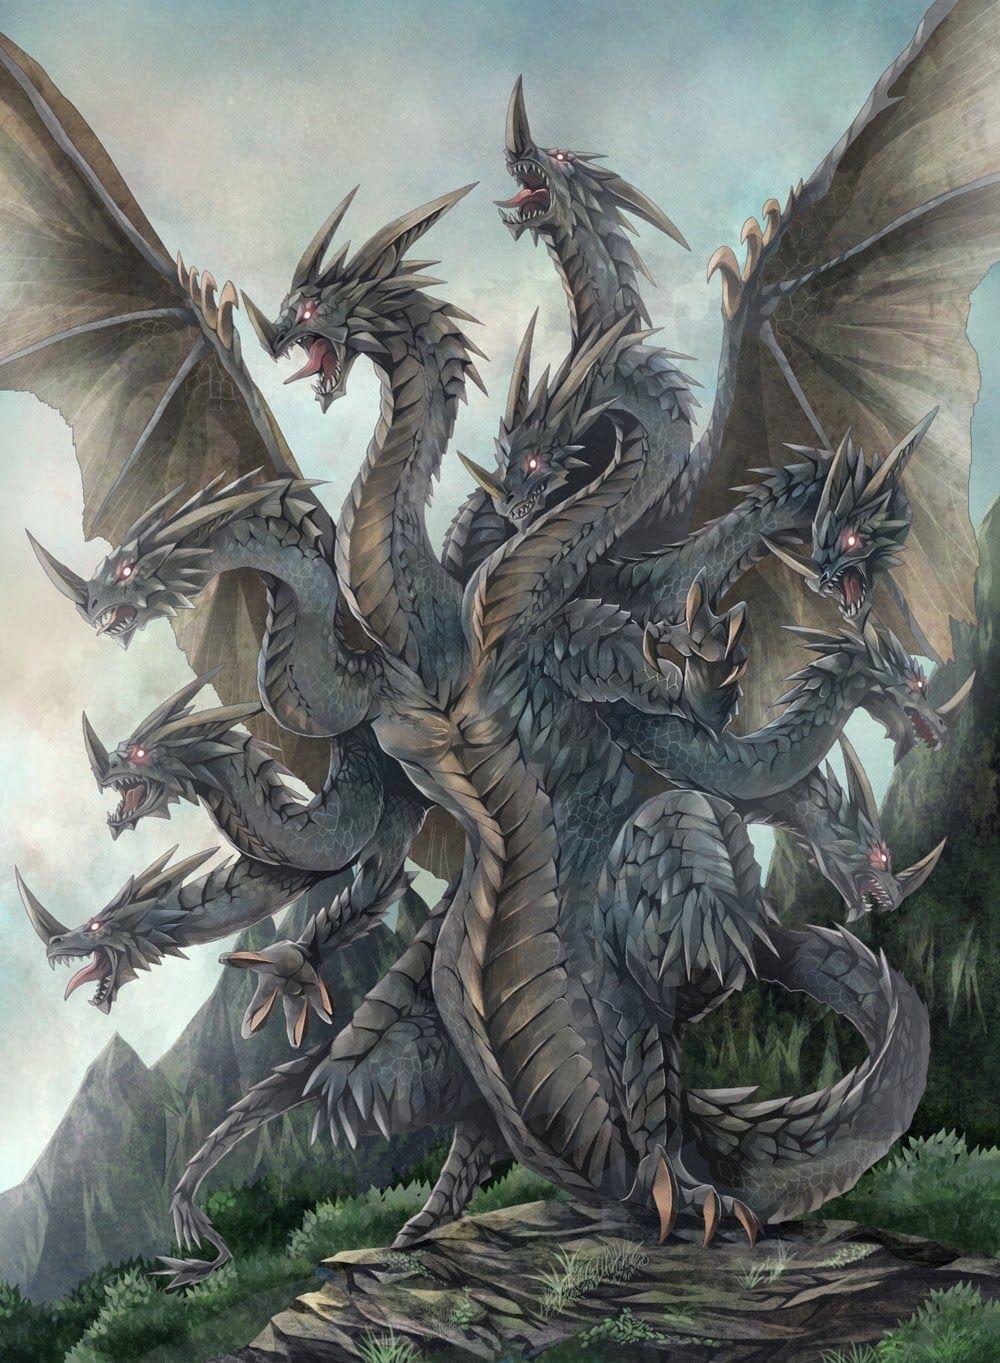 Hydra Mythical Creature Dragon